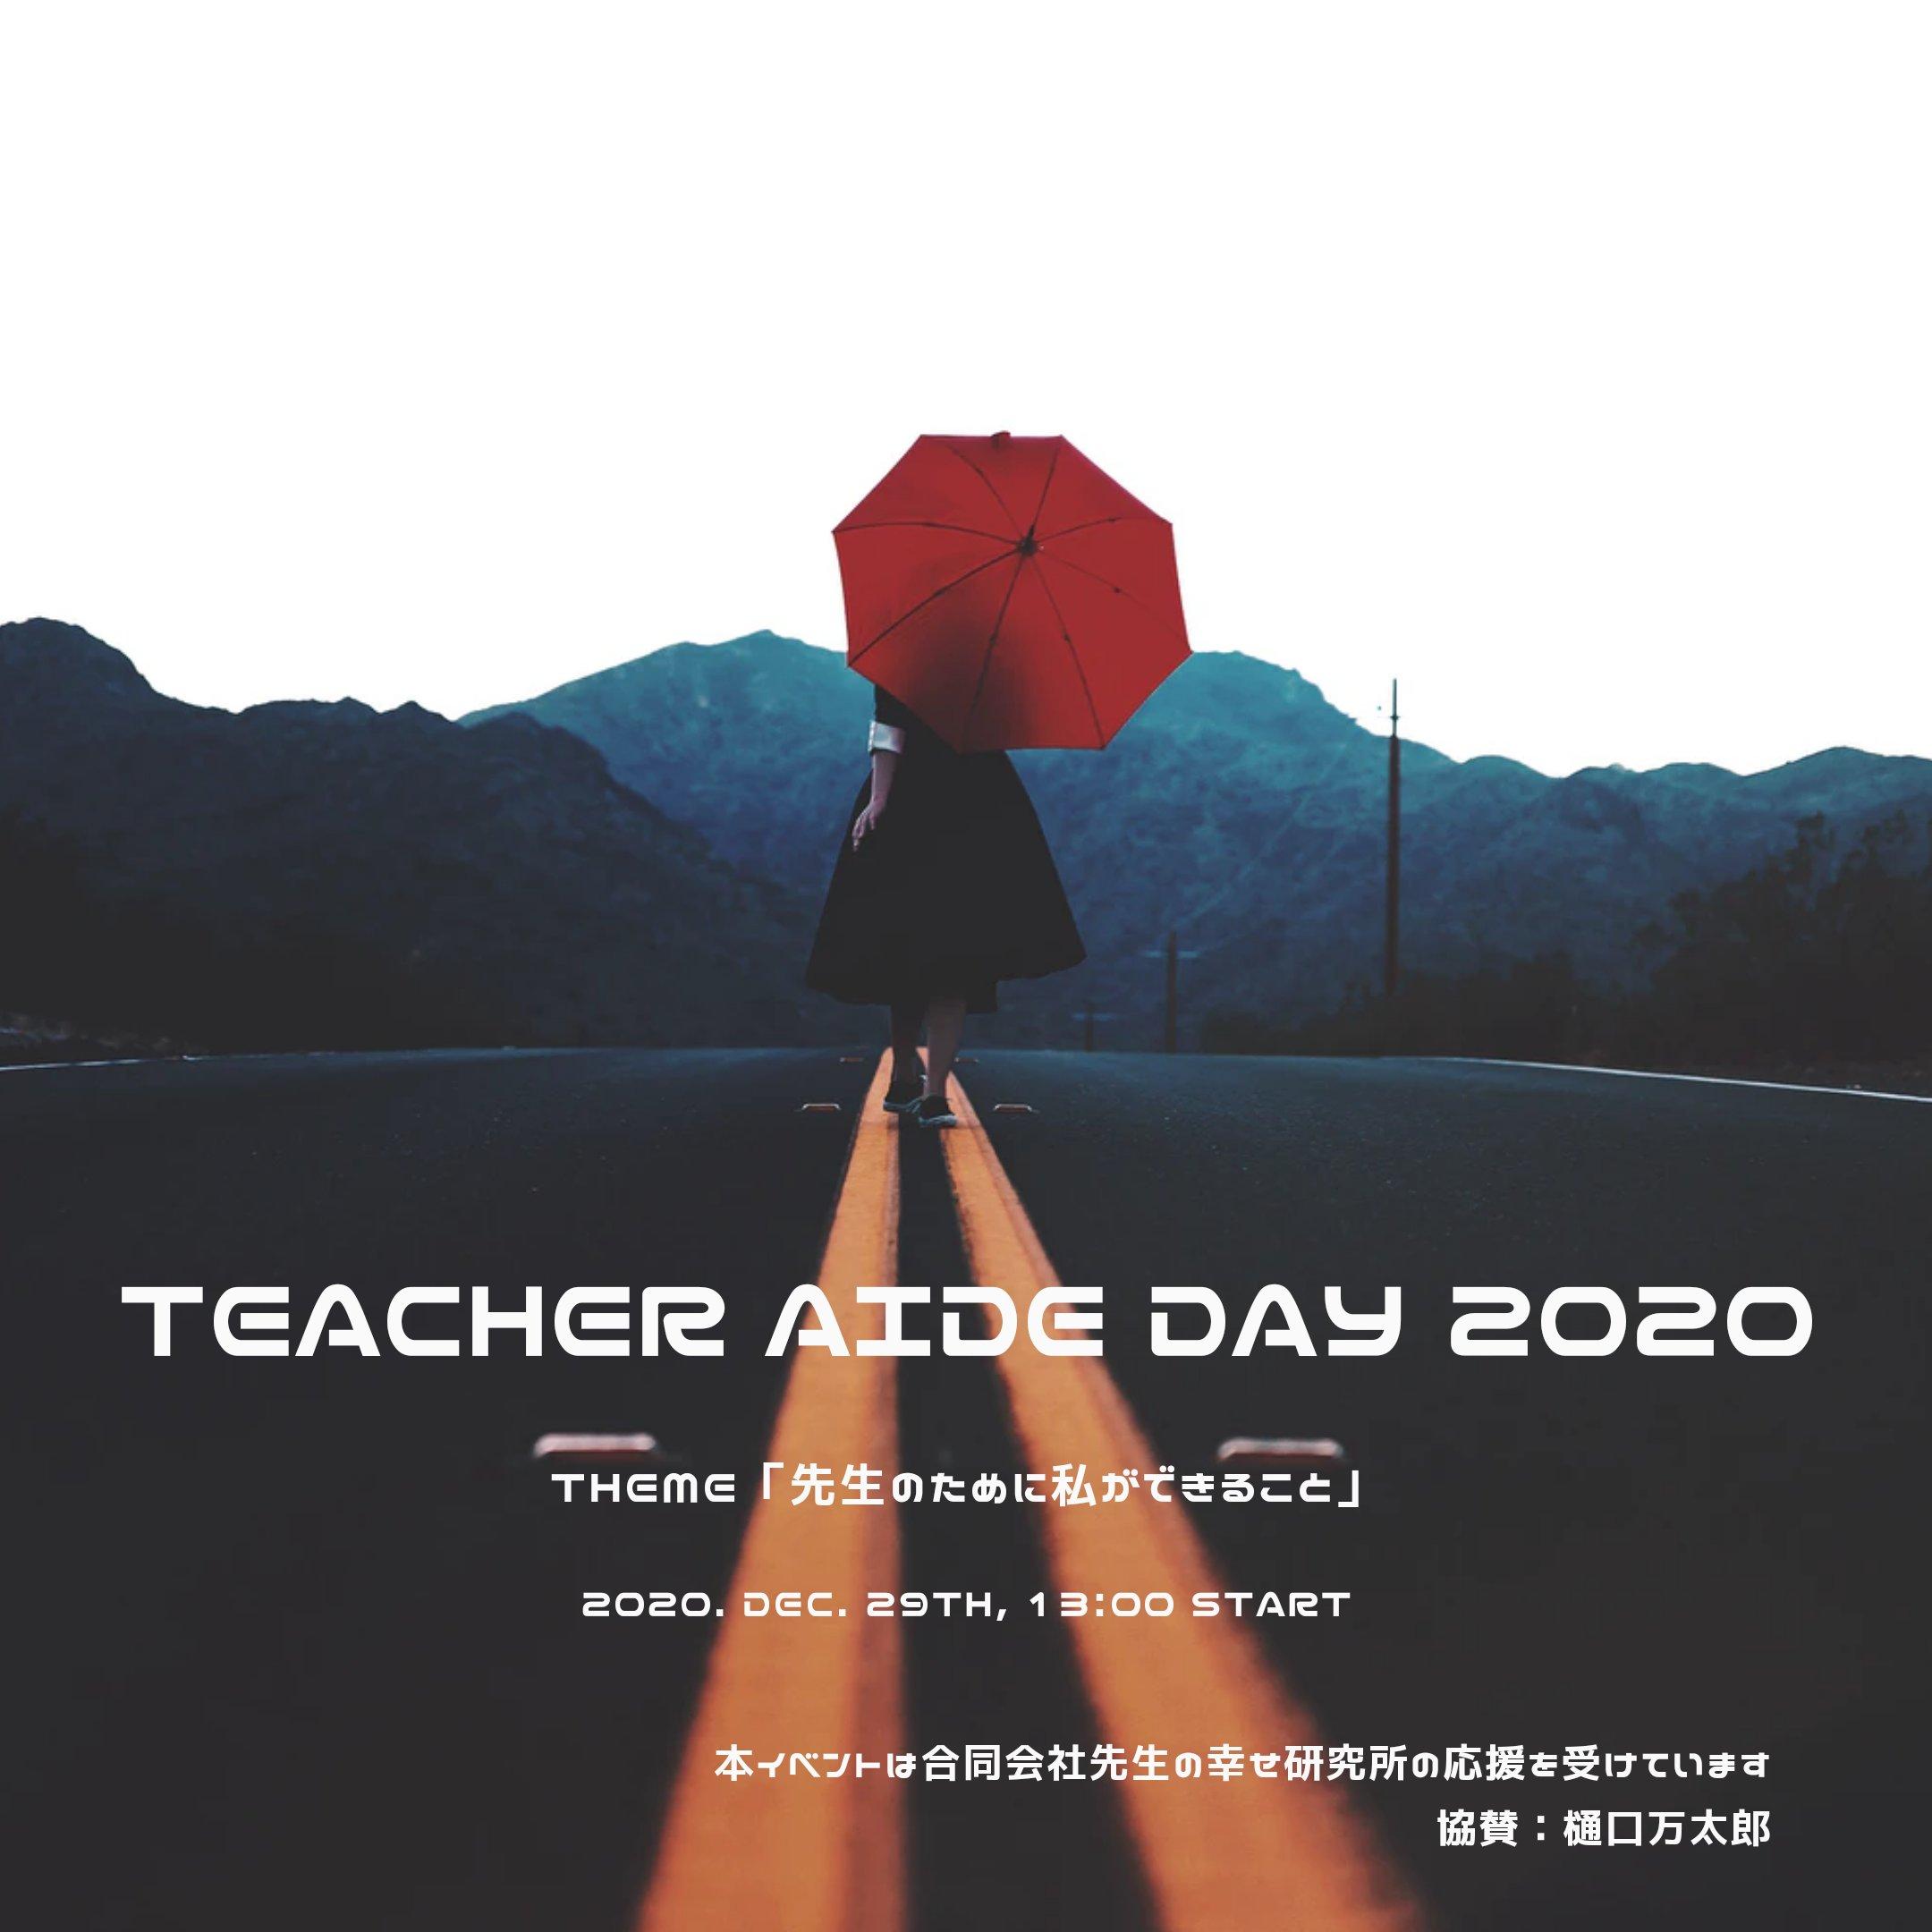 teacher-aide-day-2020